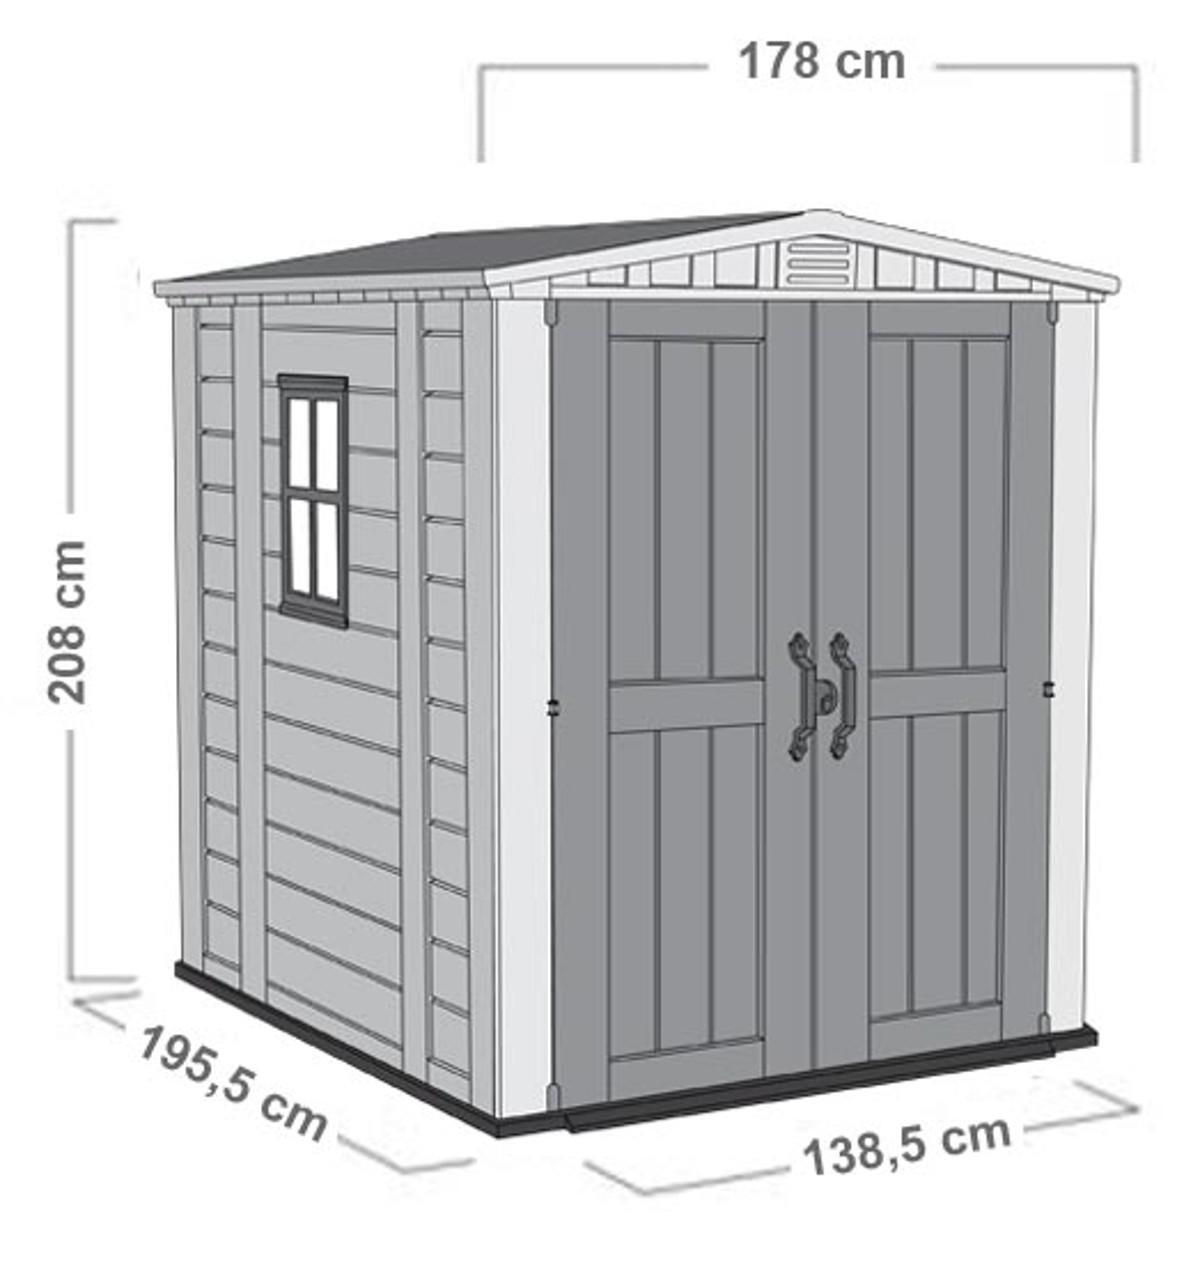 Casetta da giardino in polipropilene Factor, superficie interna 2.95 m² e spessore parete 16 mm - 2